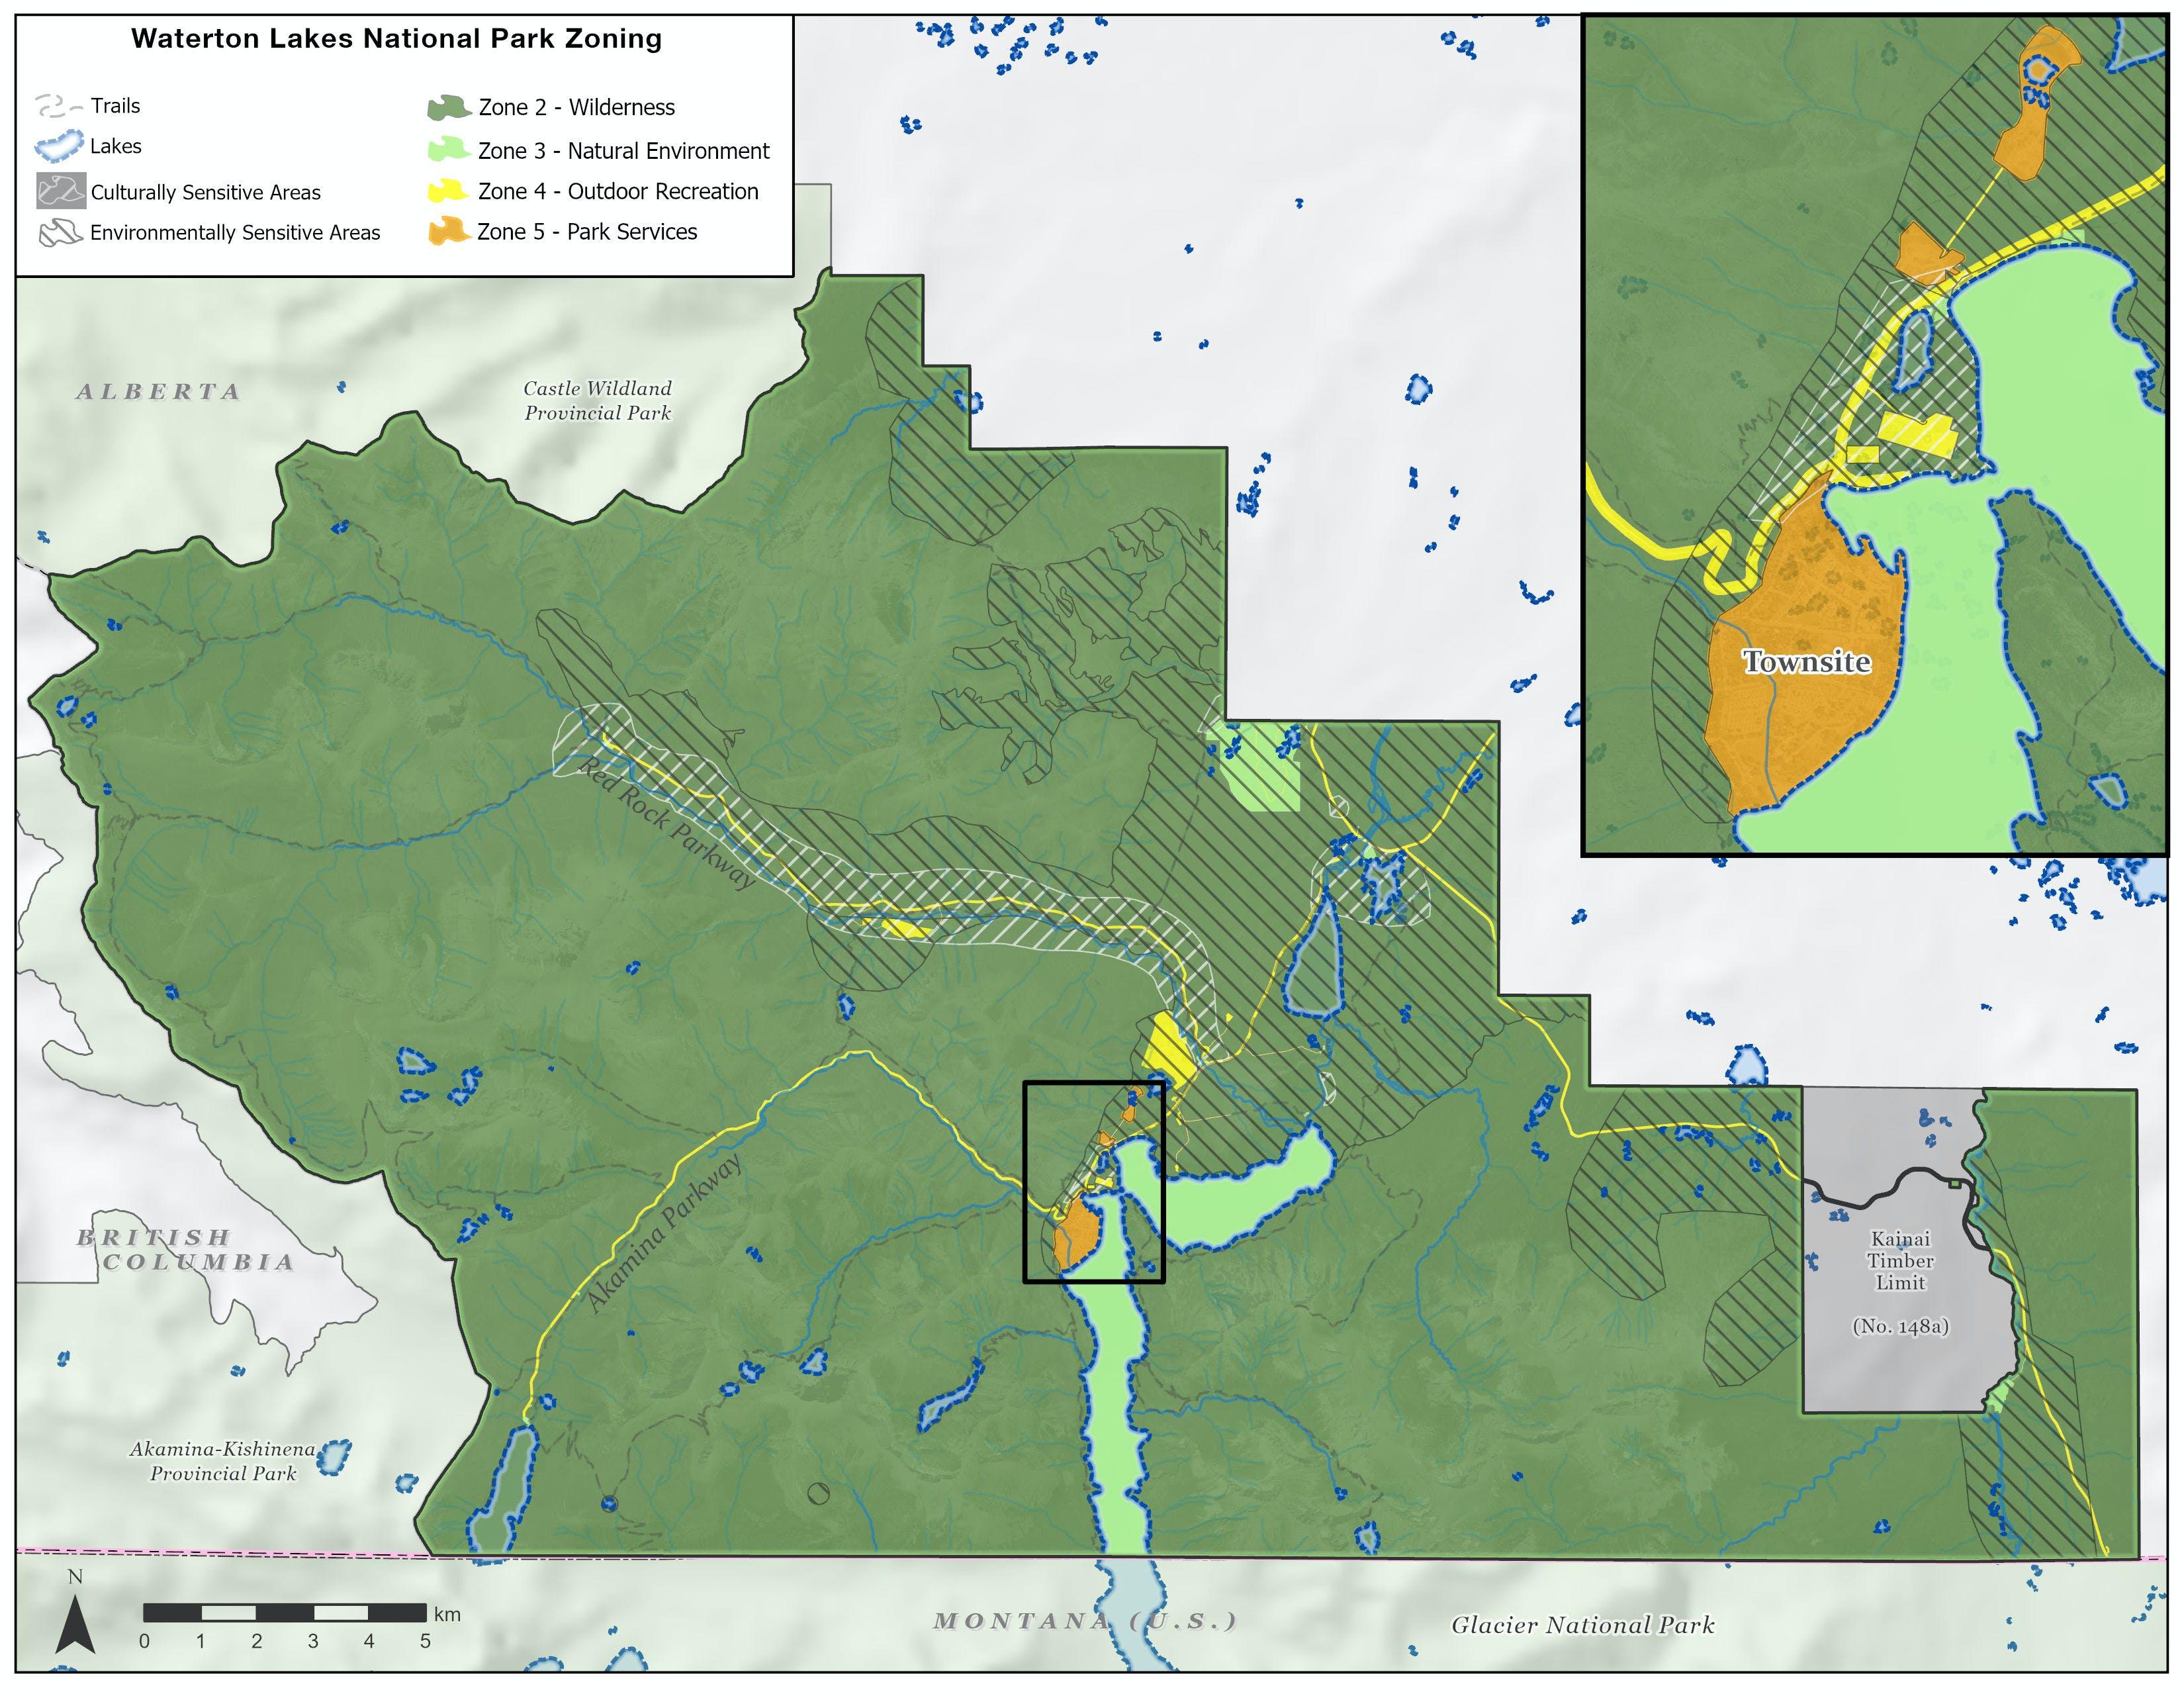 Waterton Lakes National Park Zoning